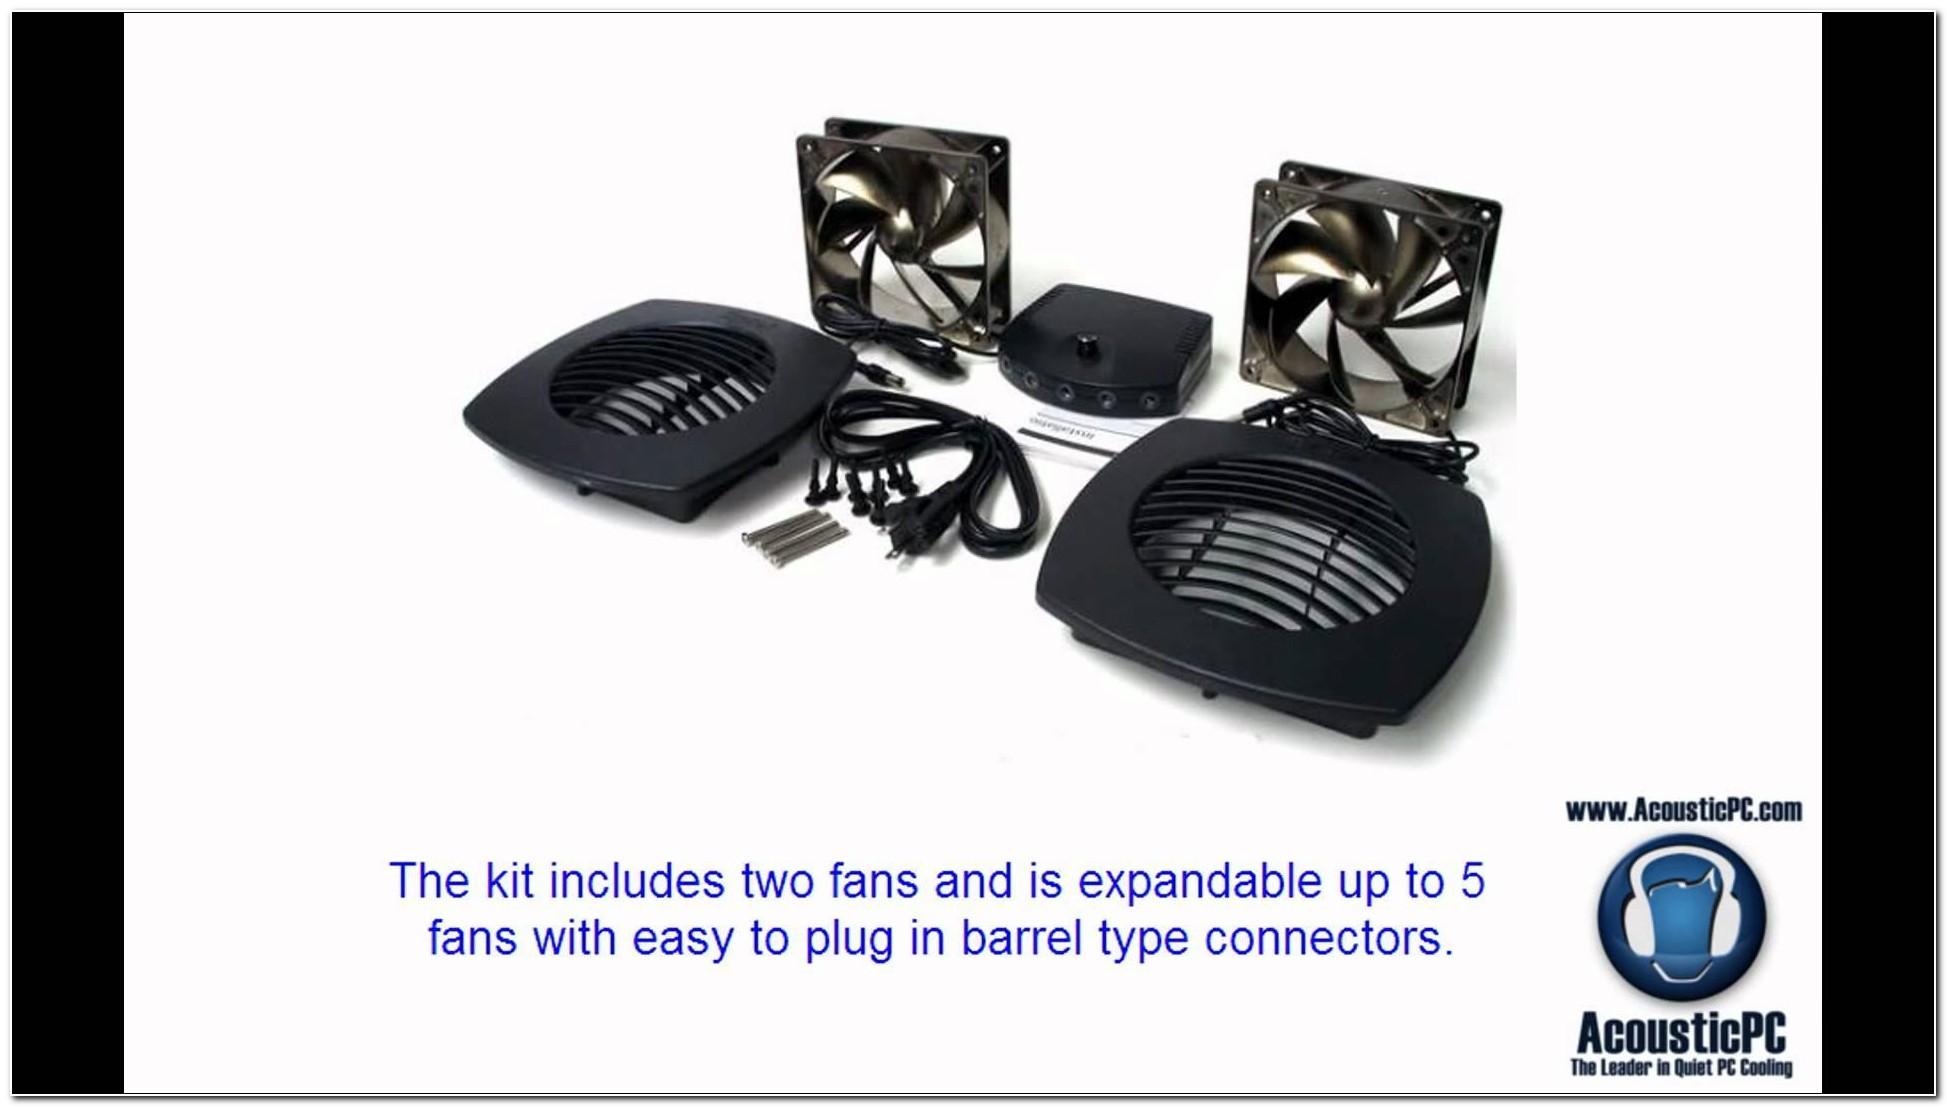 Av Cabinet Cooling Fan Uk